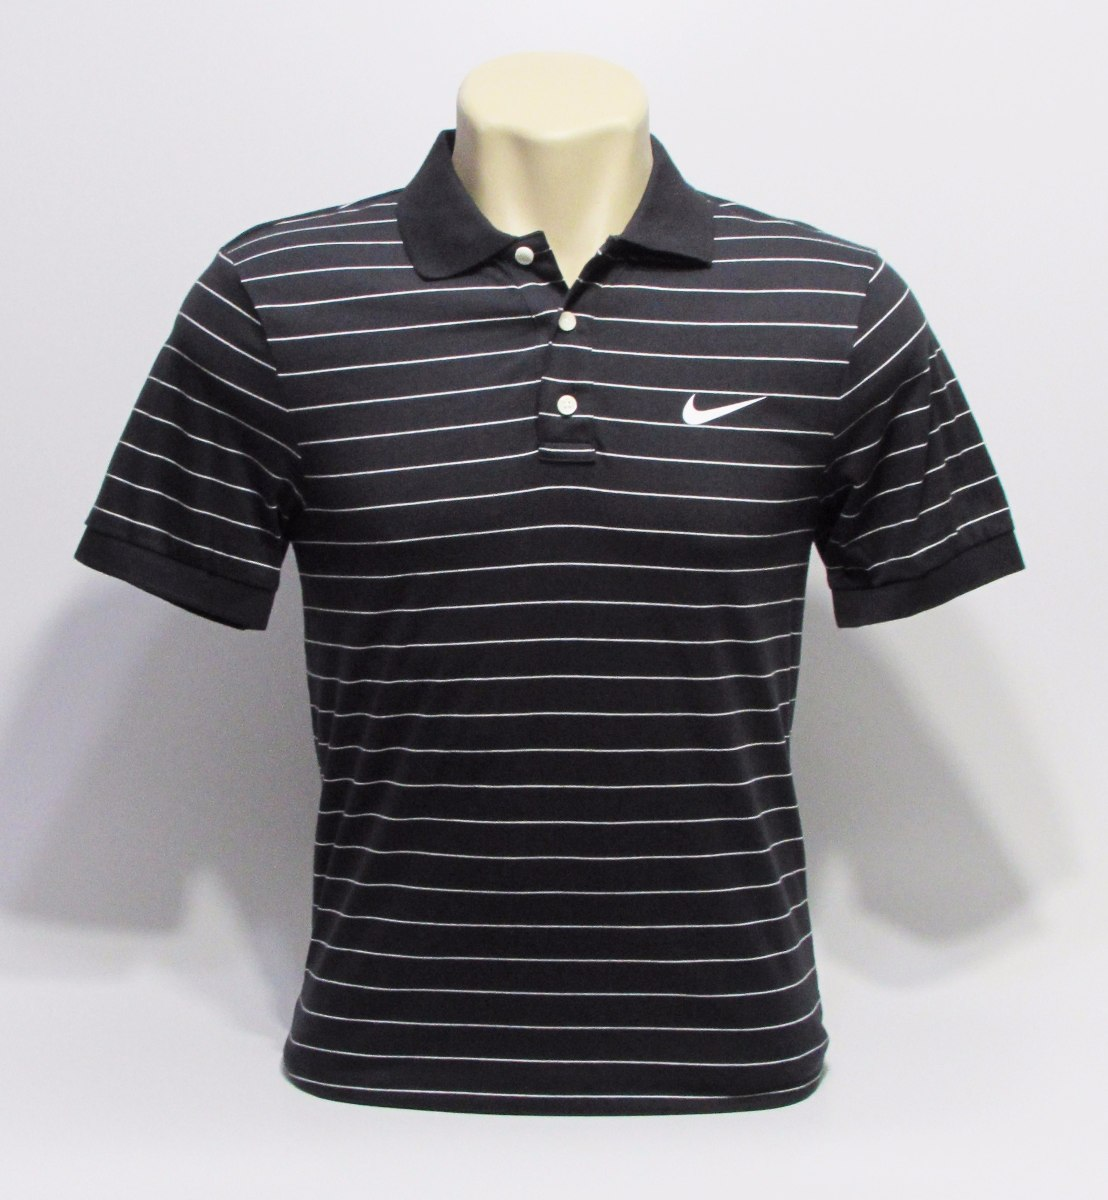 Camisa Nike Polo Preta Listrada Masculina De 189 8d29d41bc2bf2